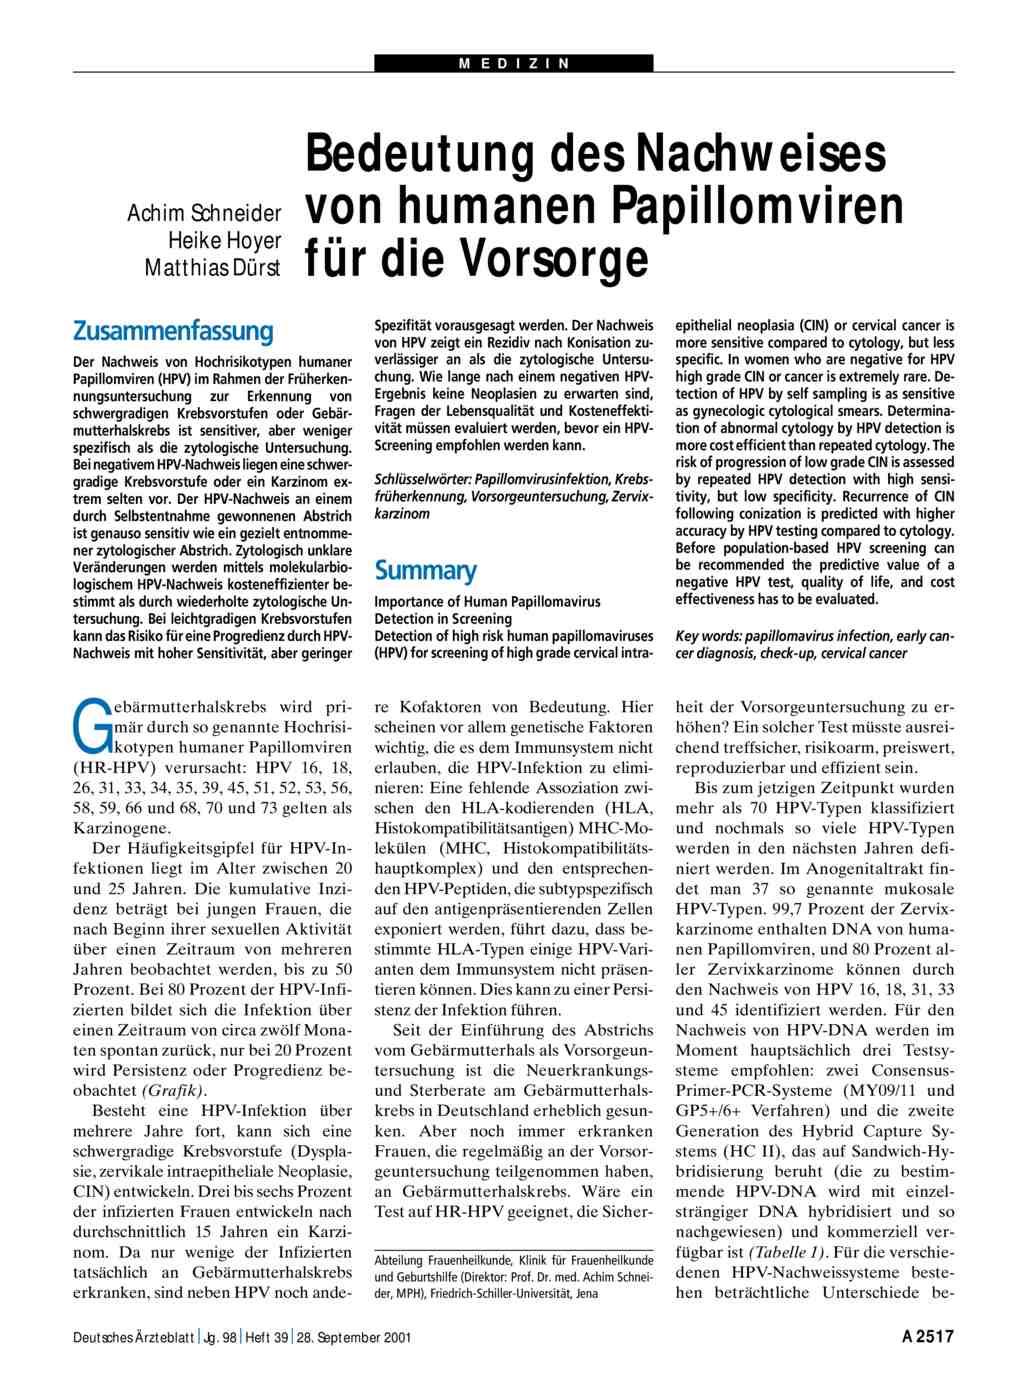 papillomavirus nachweis mann